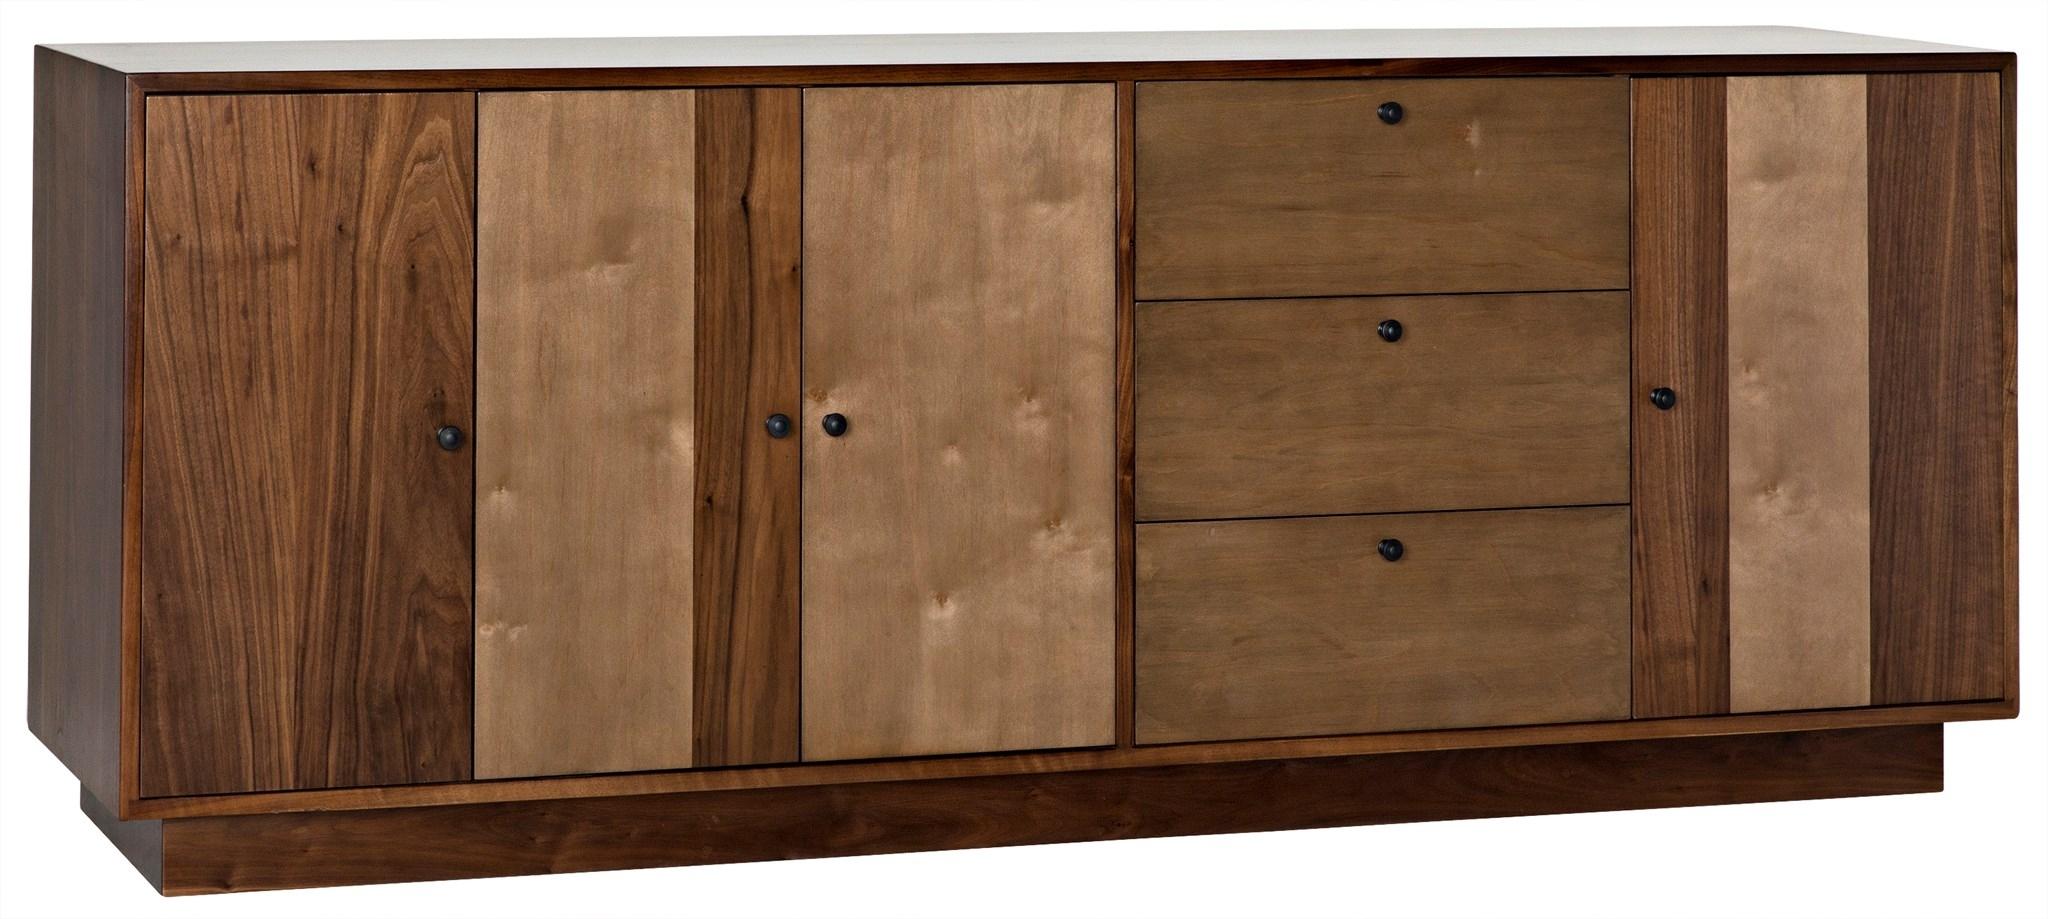 Cfc :: in Walnut Finish 4-Door Sideboards (Image 4 of 30)